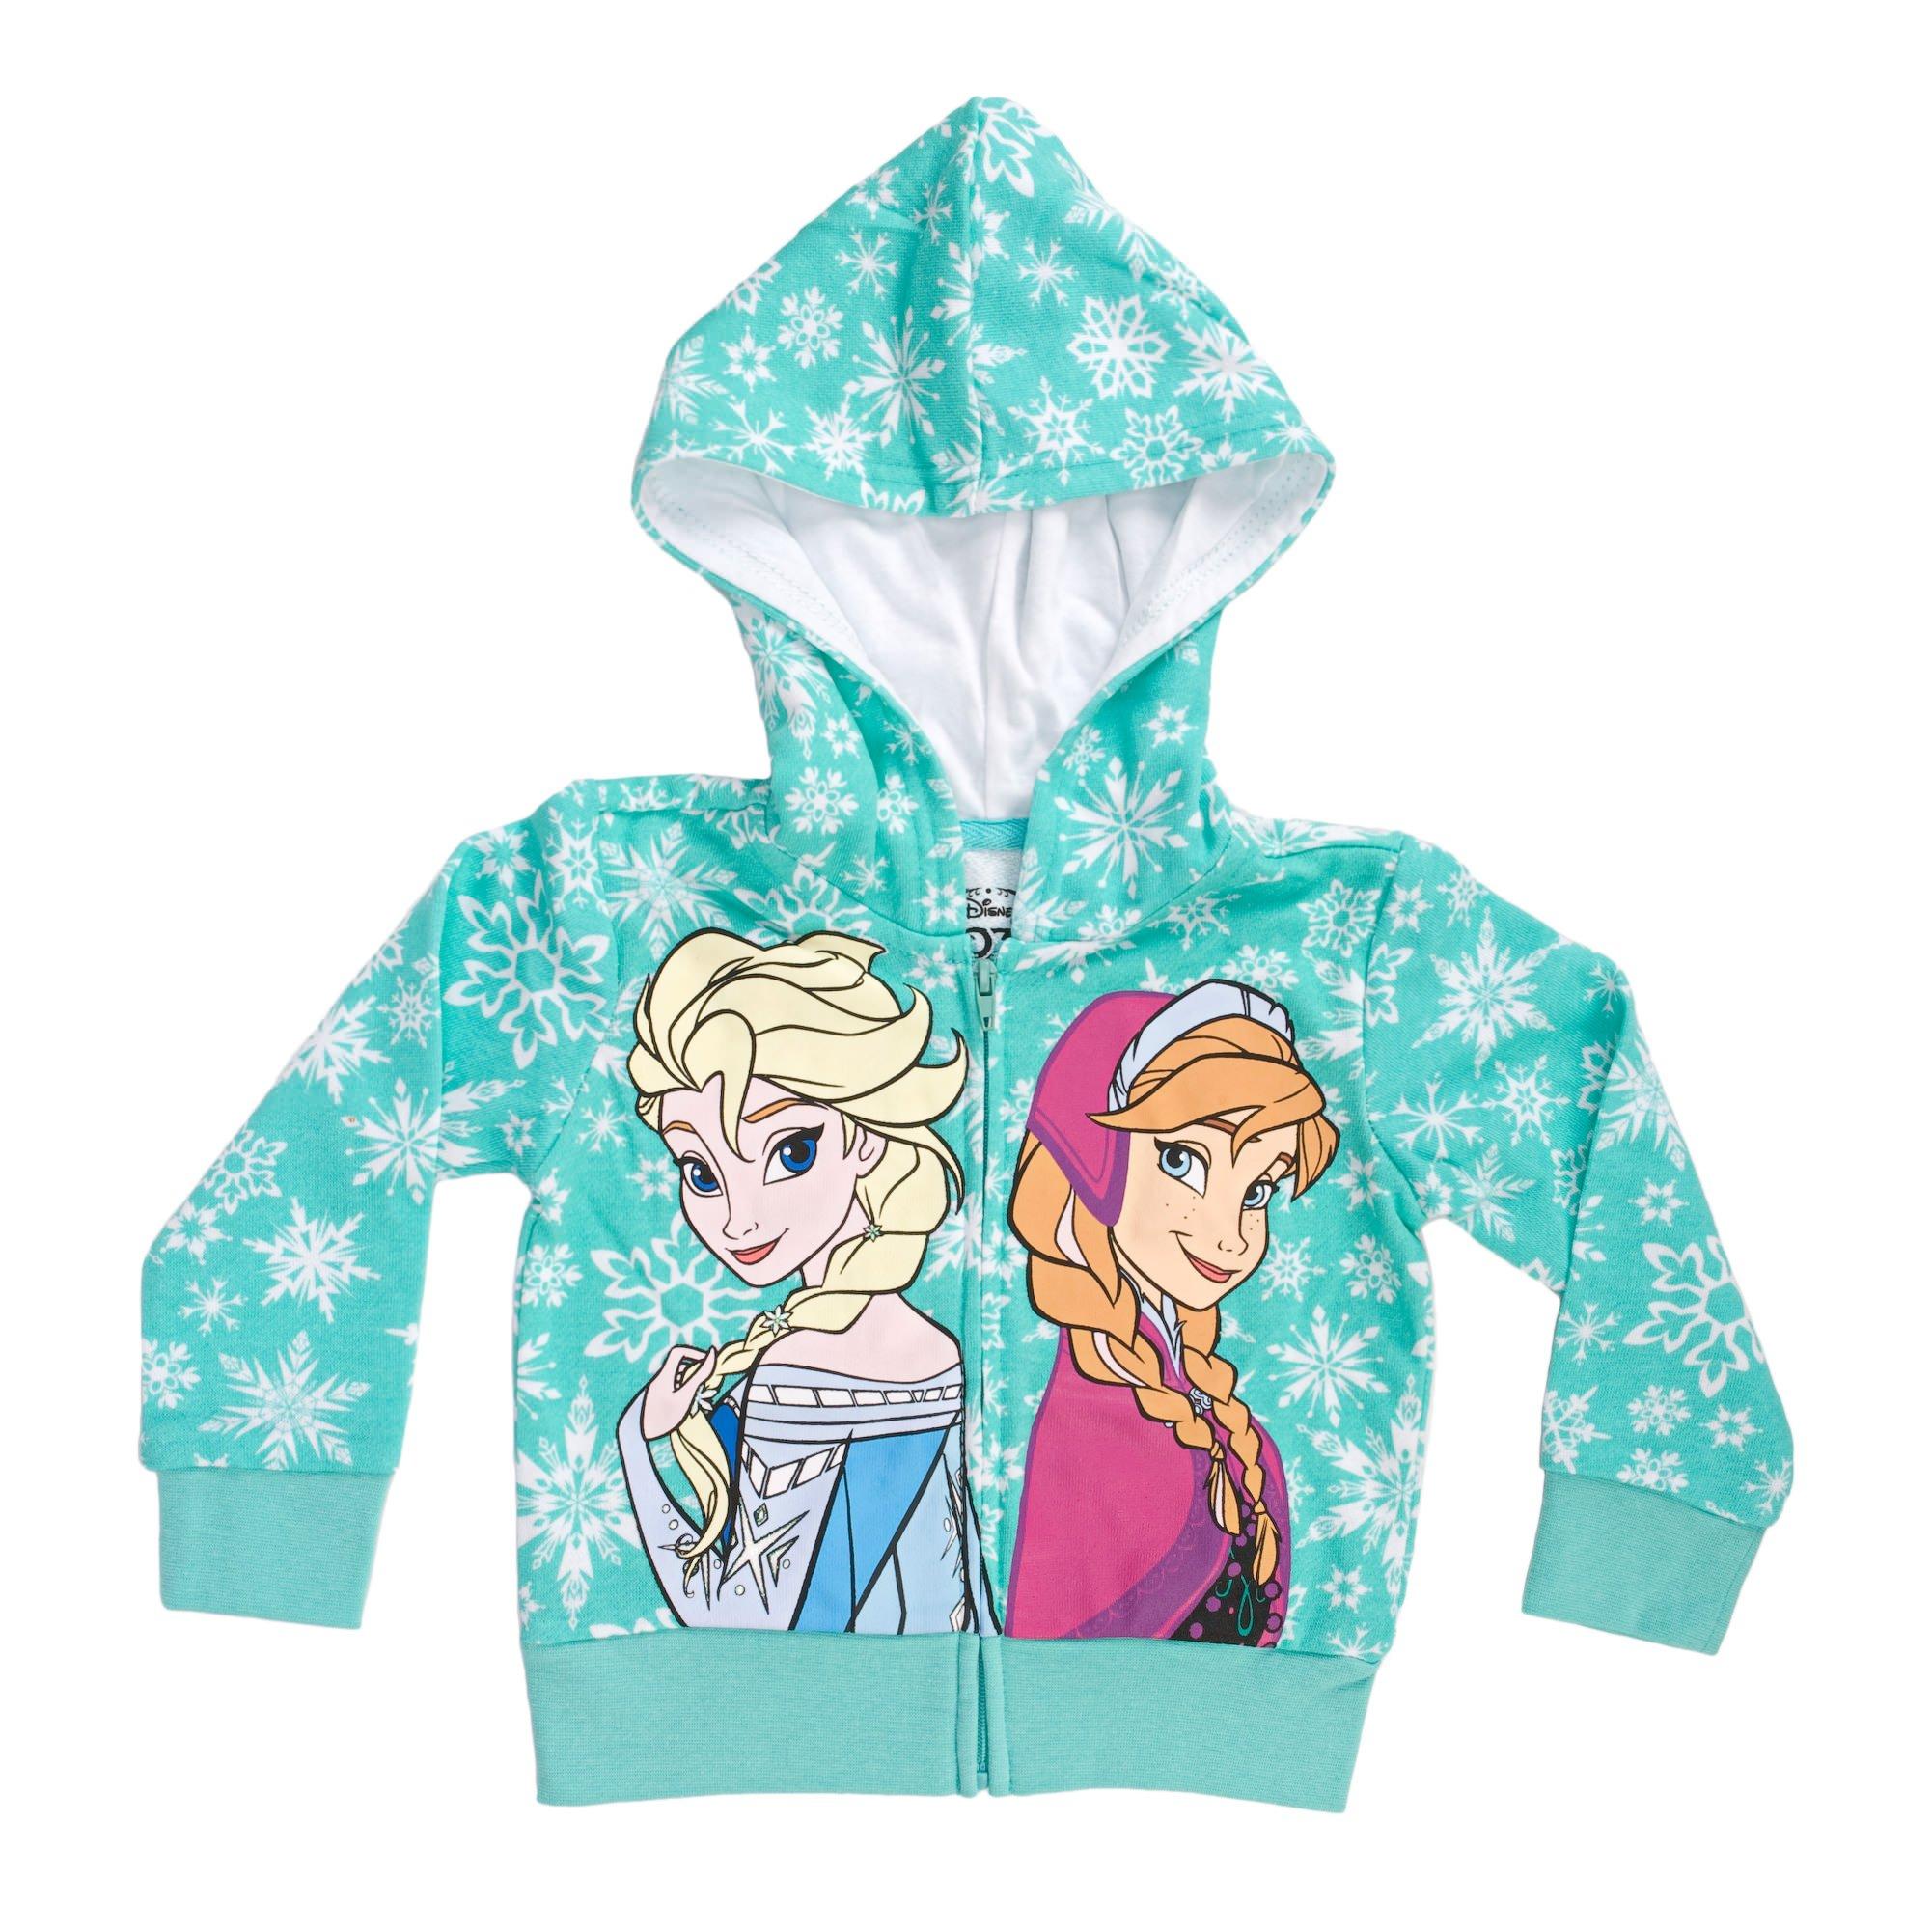 Disney Frozen Snowflakes Sisters Girls Mint Green Zip-Up Hoodie Sweatshirt   2T